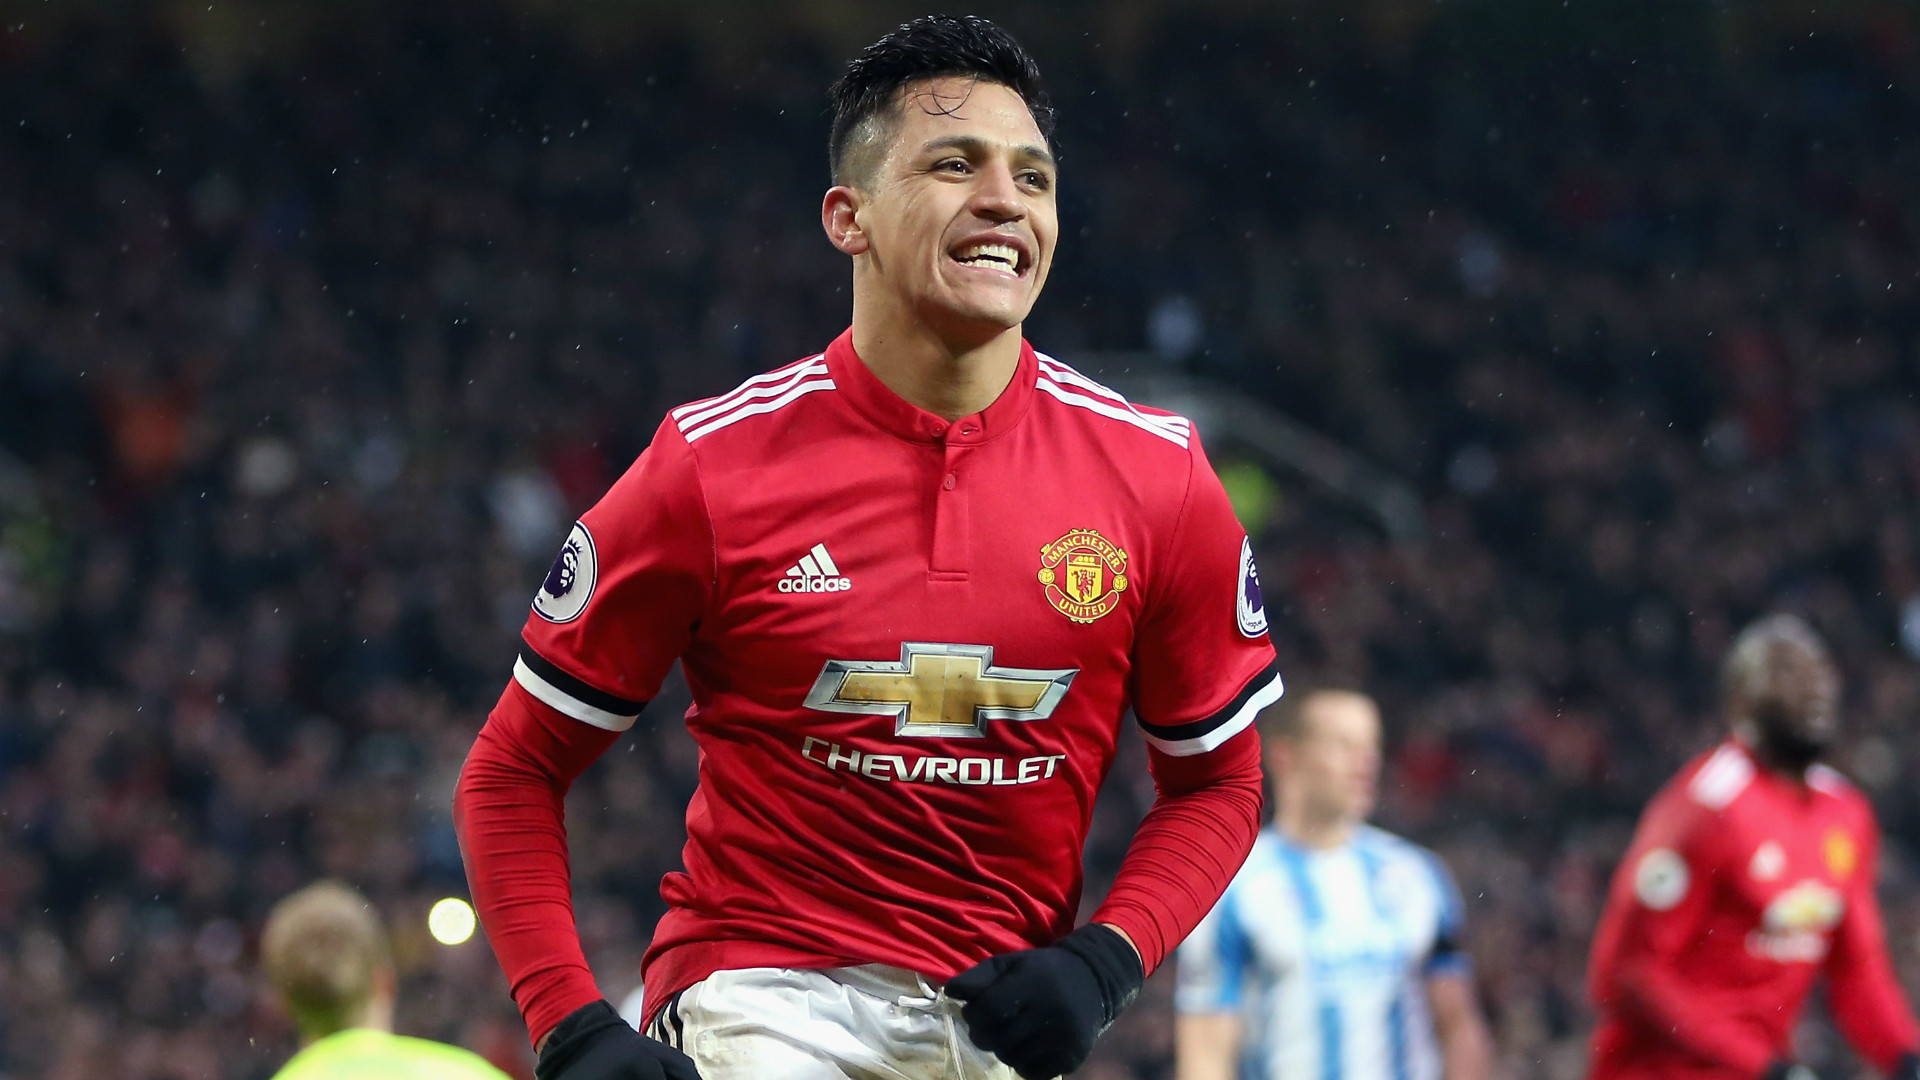 on sale 4589b 805e5 Sanchez breaks shirt-sale record amid Man United loss | Goal.com